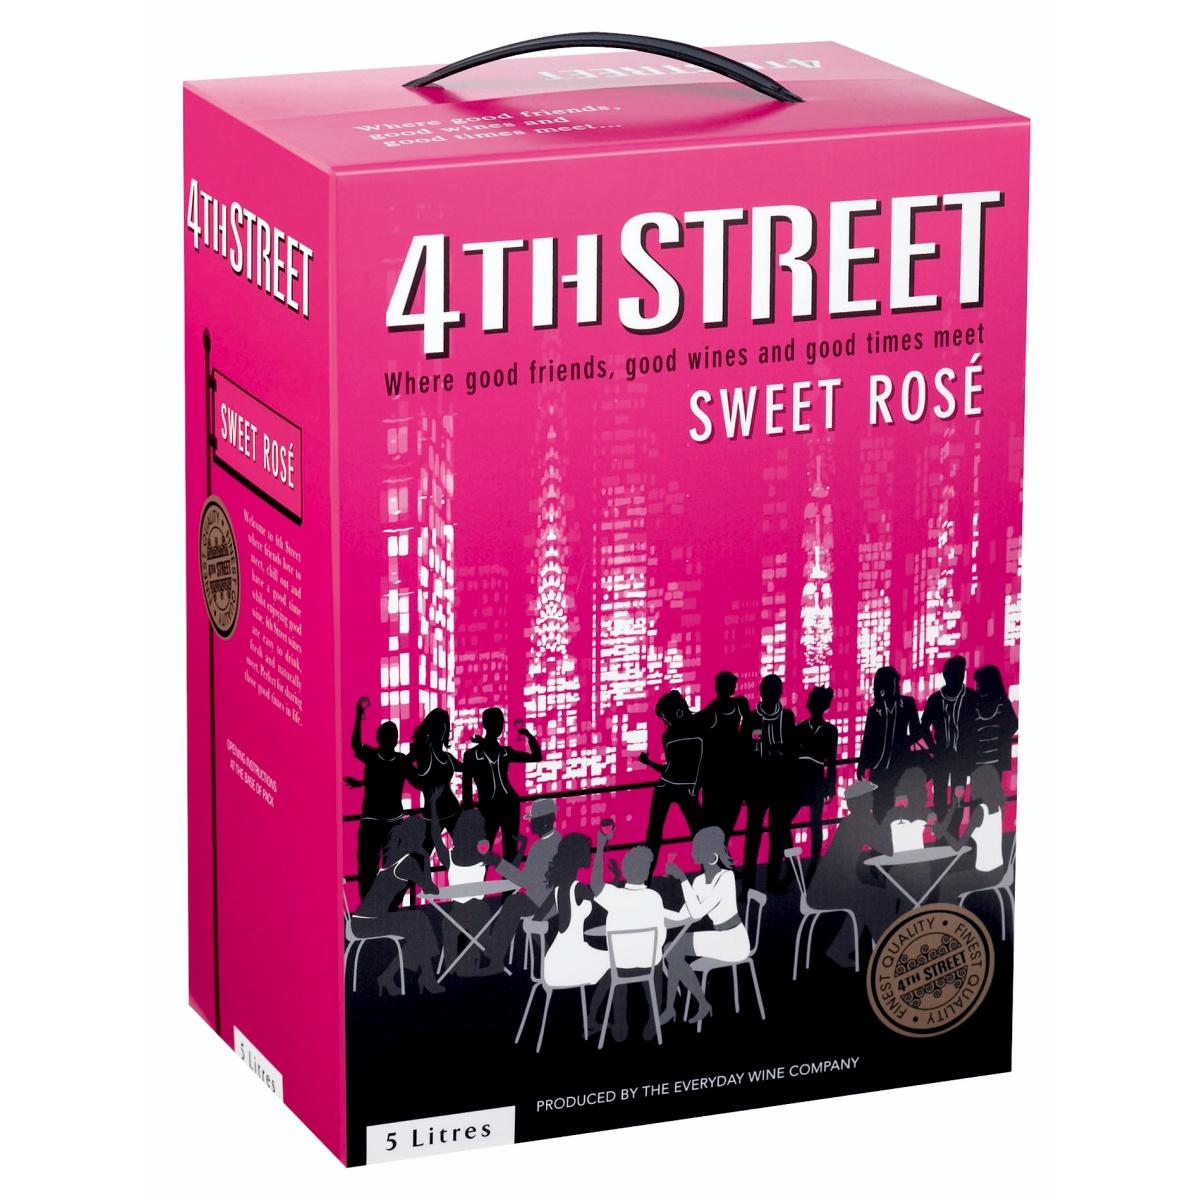 4TH STREET NATURAL SWEET ROSE 5L